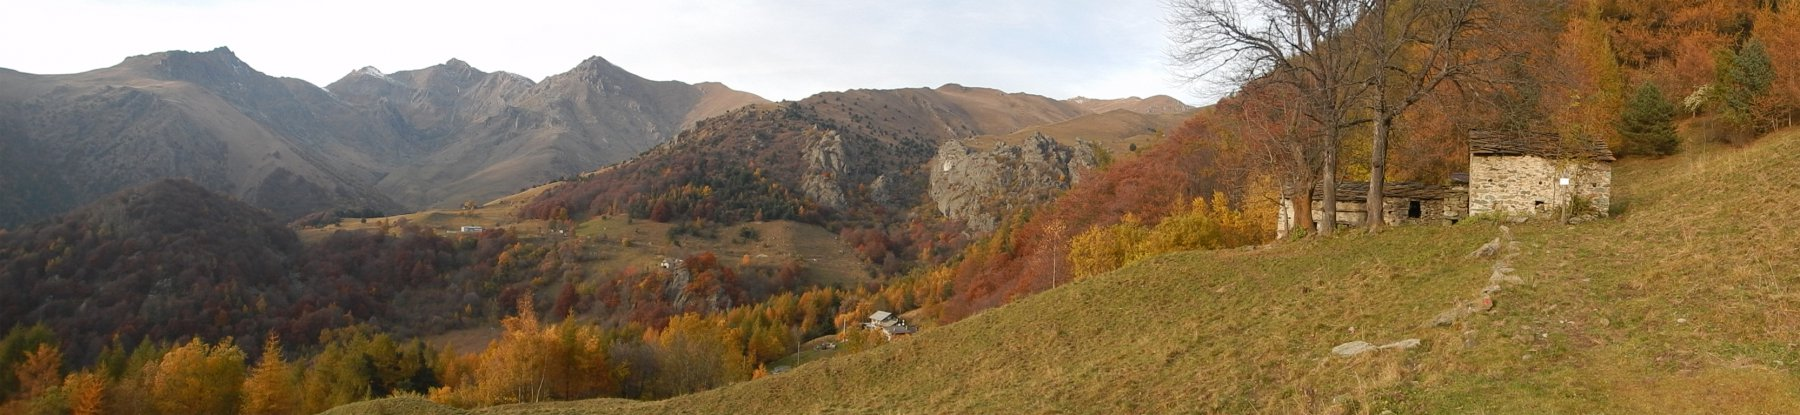 Panorama dall'alpe Goia